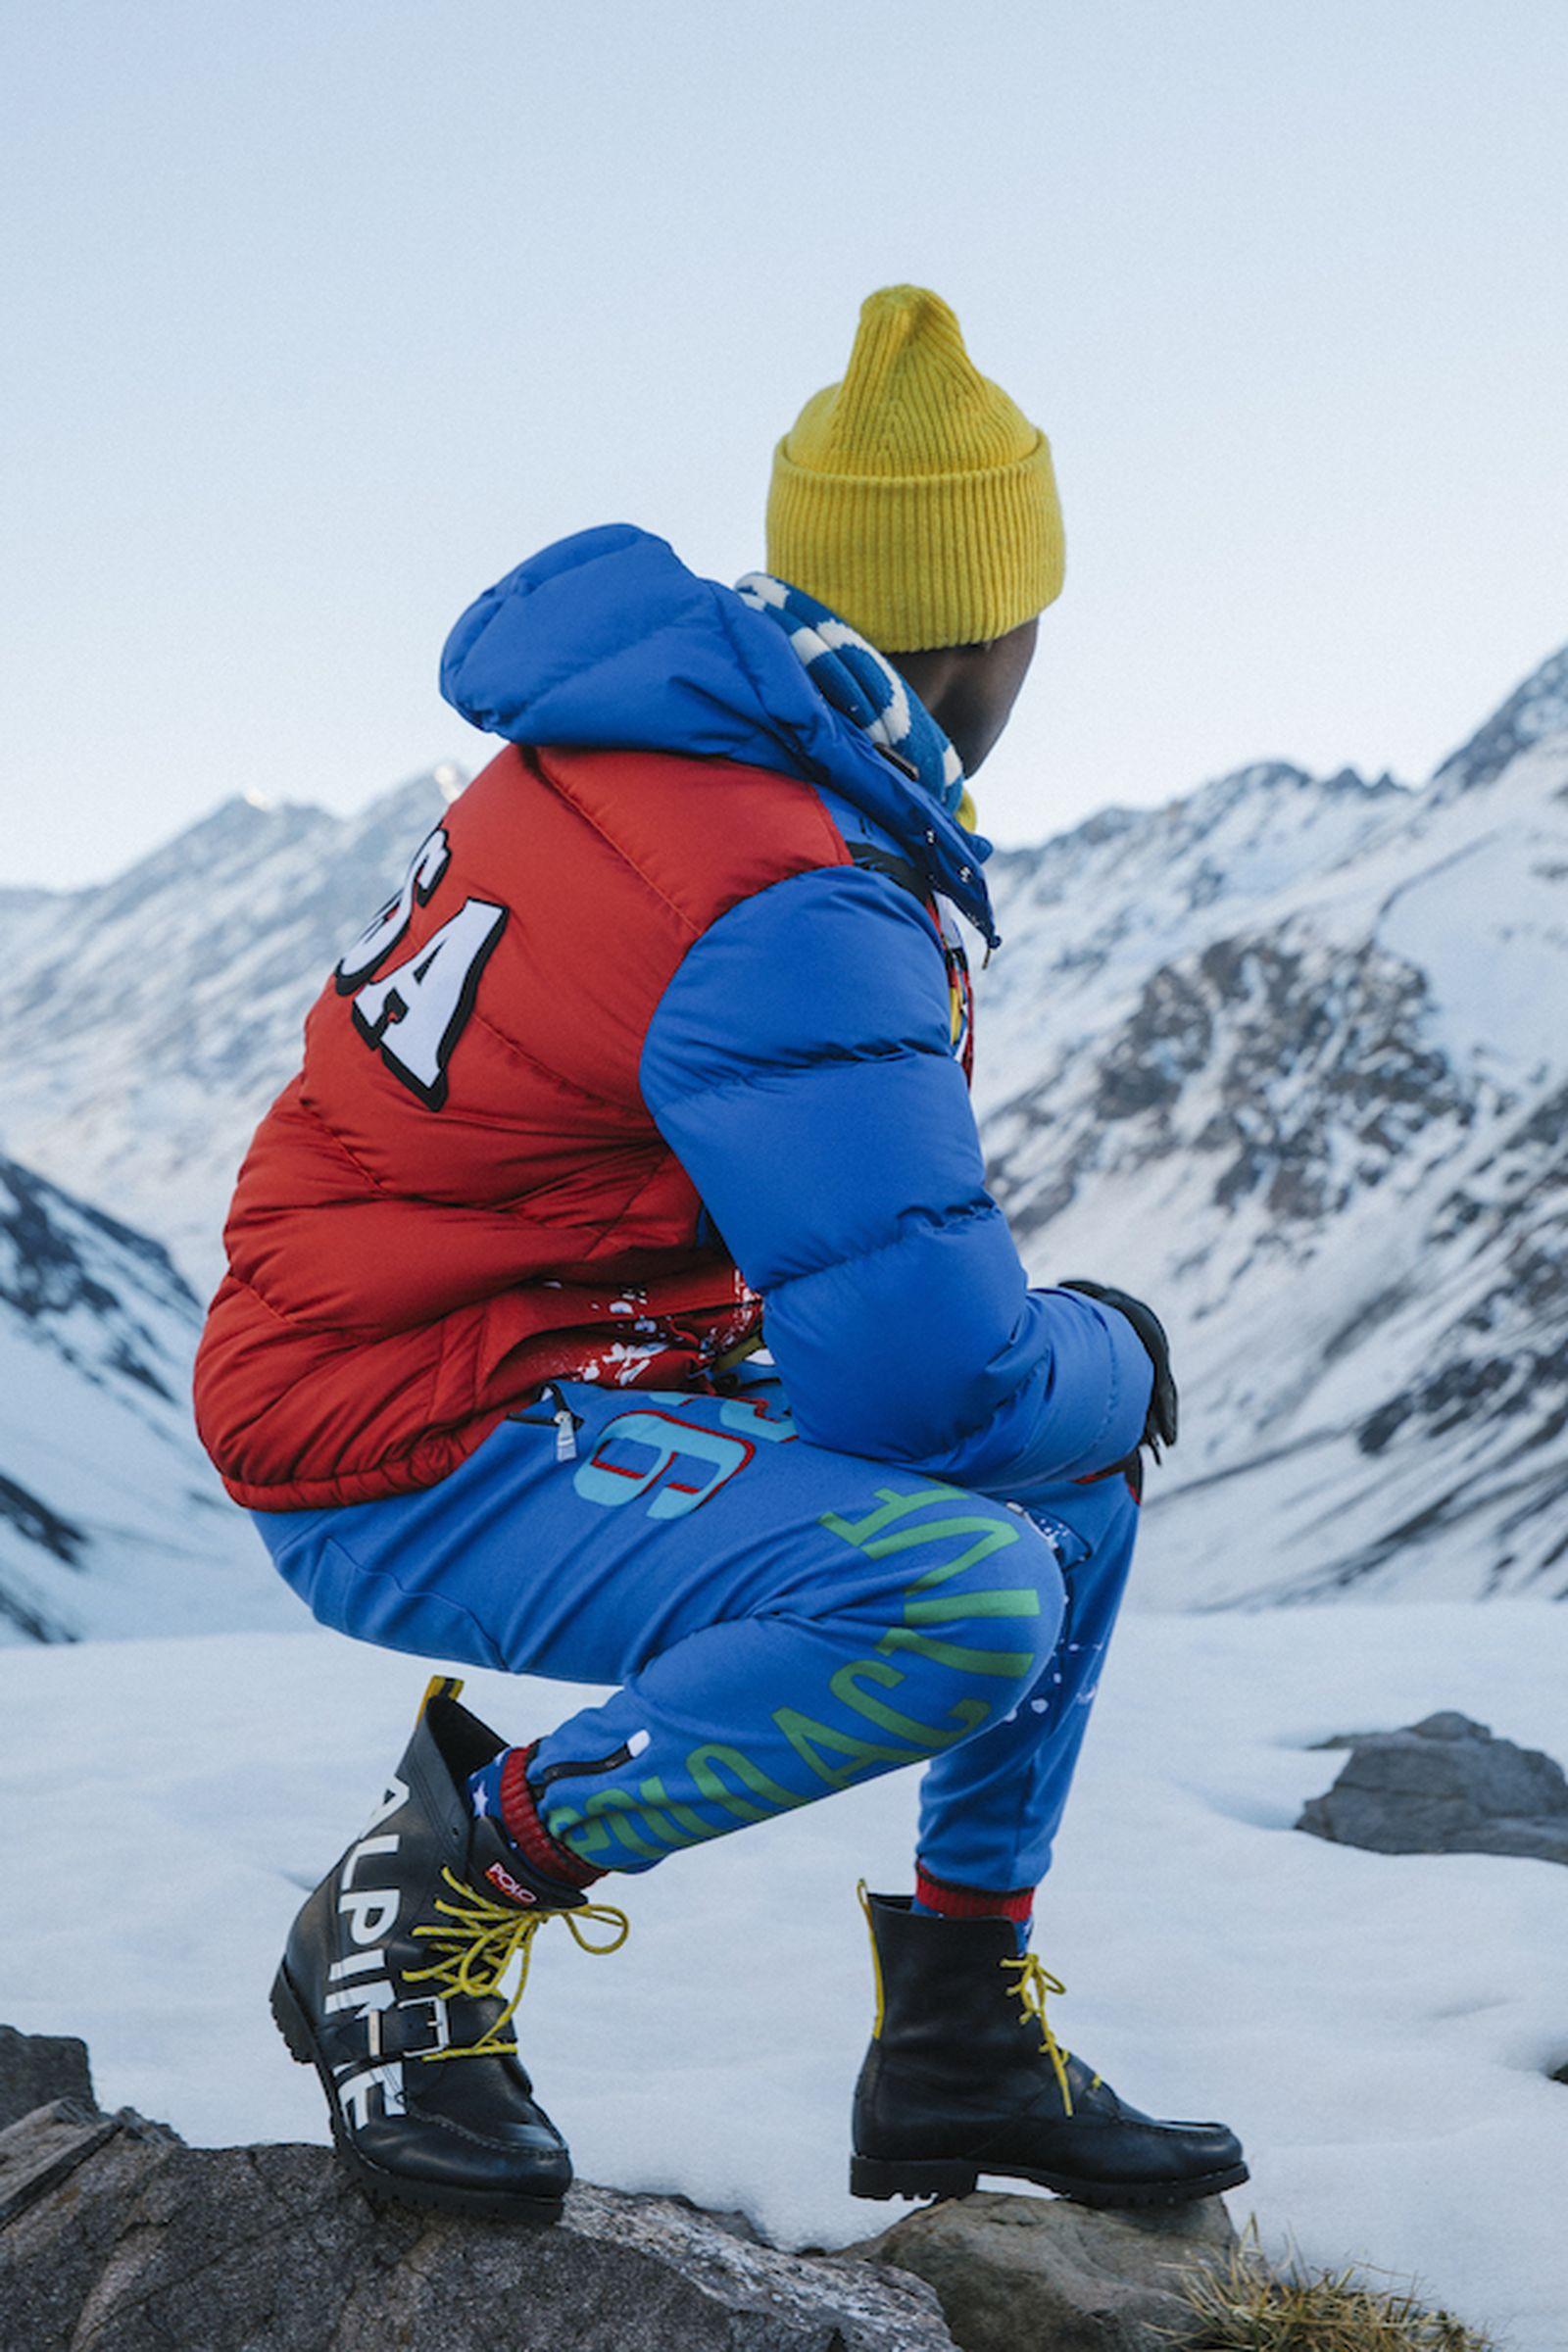 polo ralph lauren fw18 downhill skier capsule